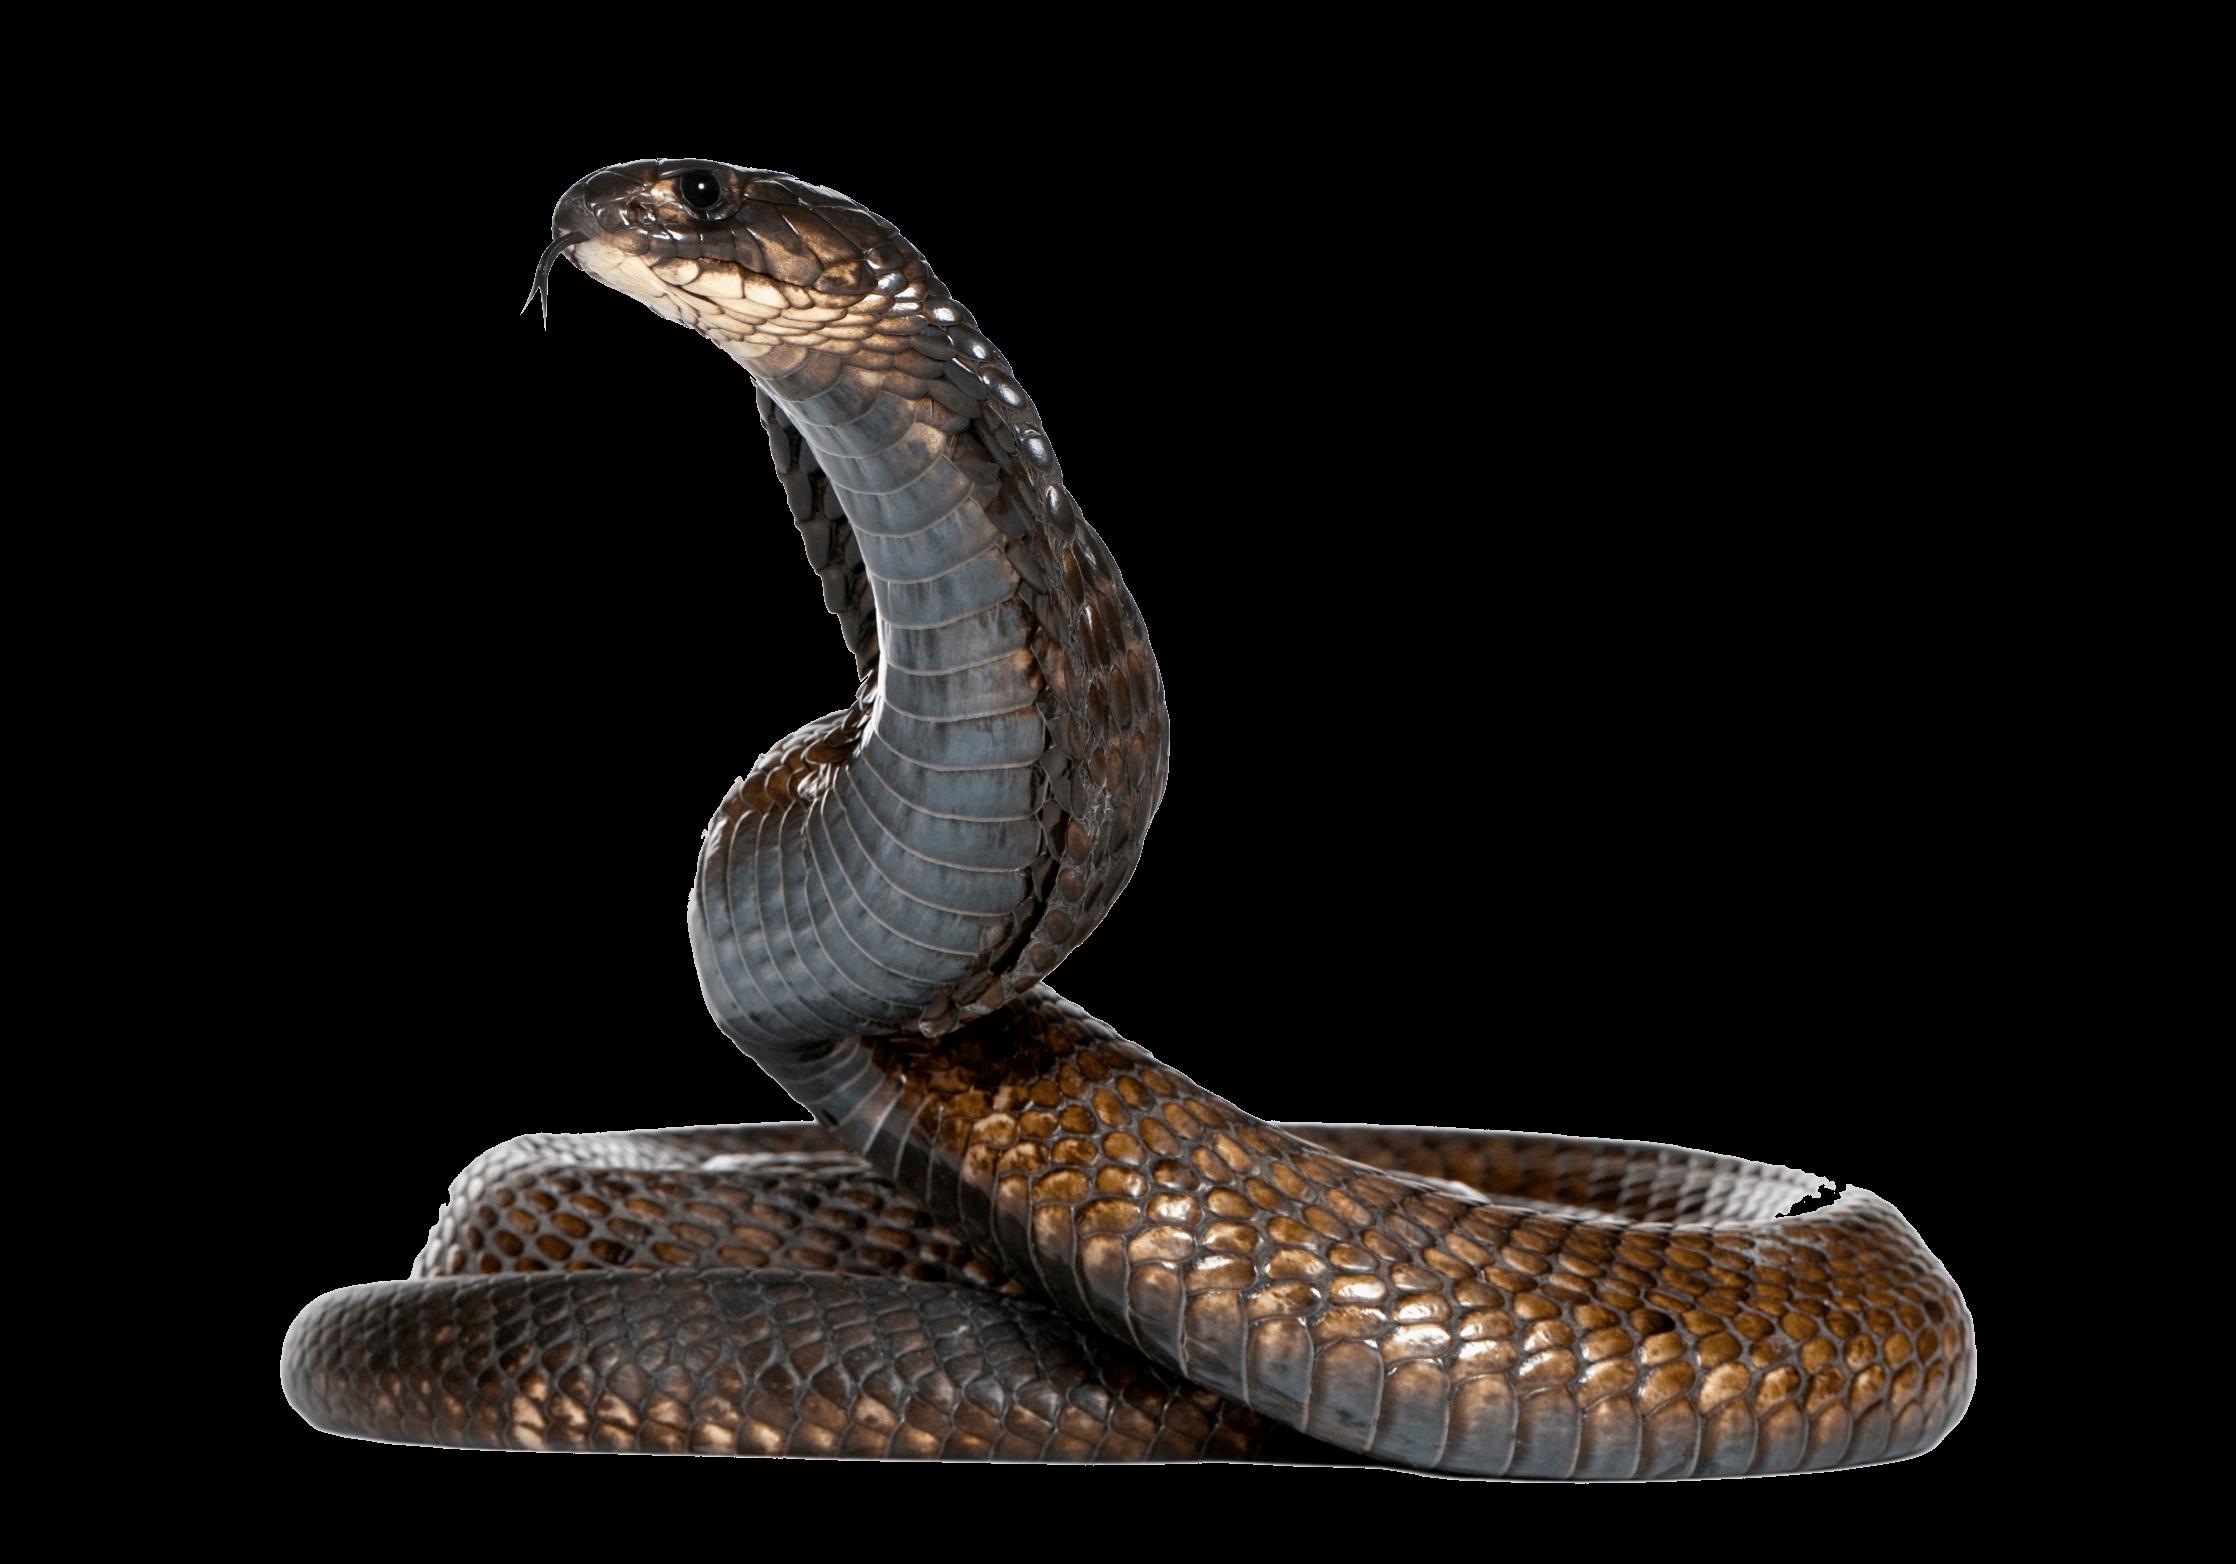 download cobra snake png image hq png image freepngimg snacks cliparts snake clipart free